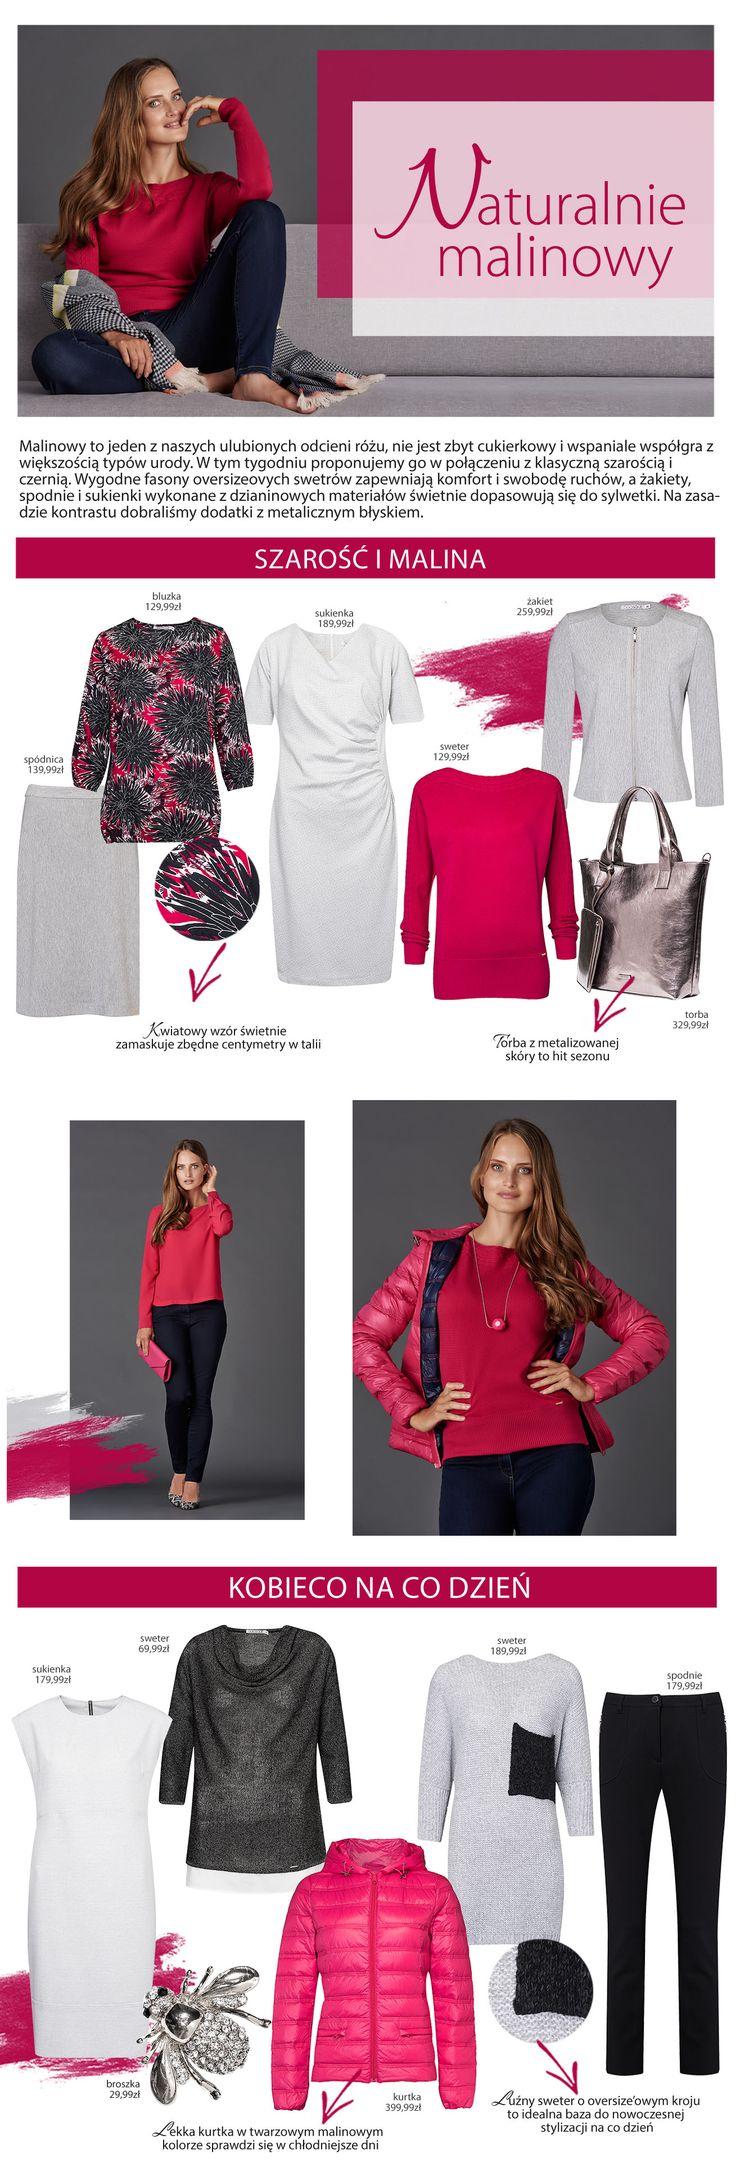 #quiosque #quiosquepl #naszainspiracja #malinowy #skirt #bag #dress #blouse #ootd #fashion #polishfashion #polishbrand #new #collection #aw1617